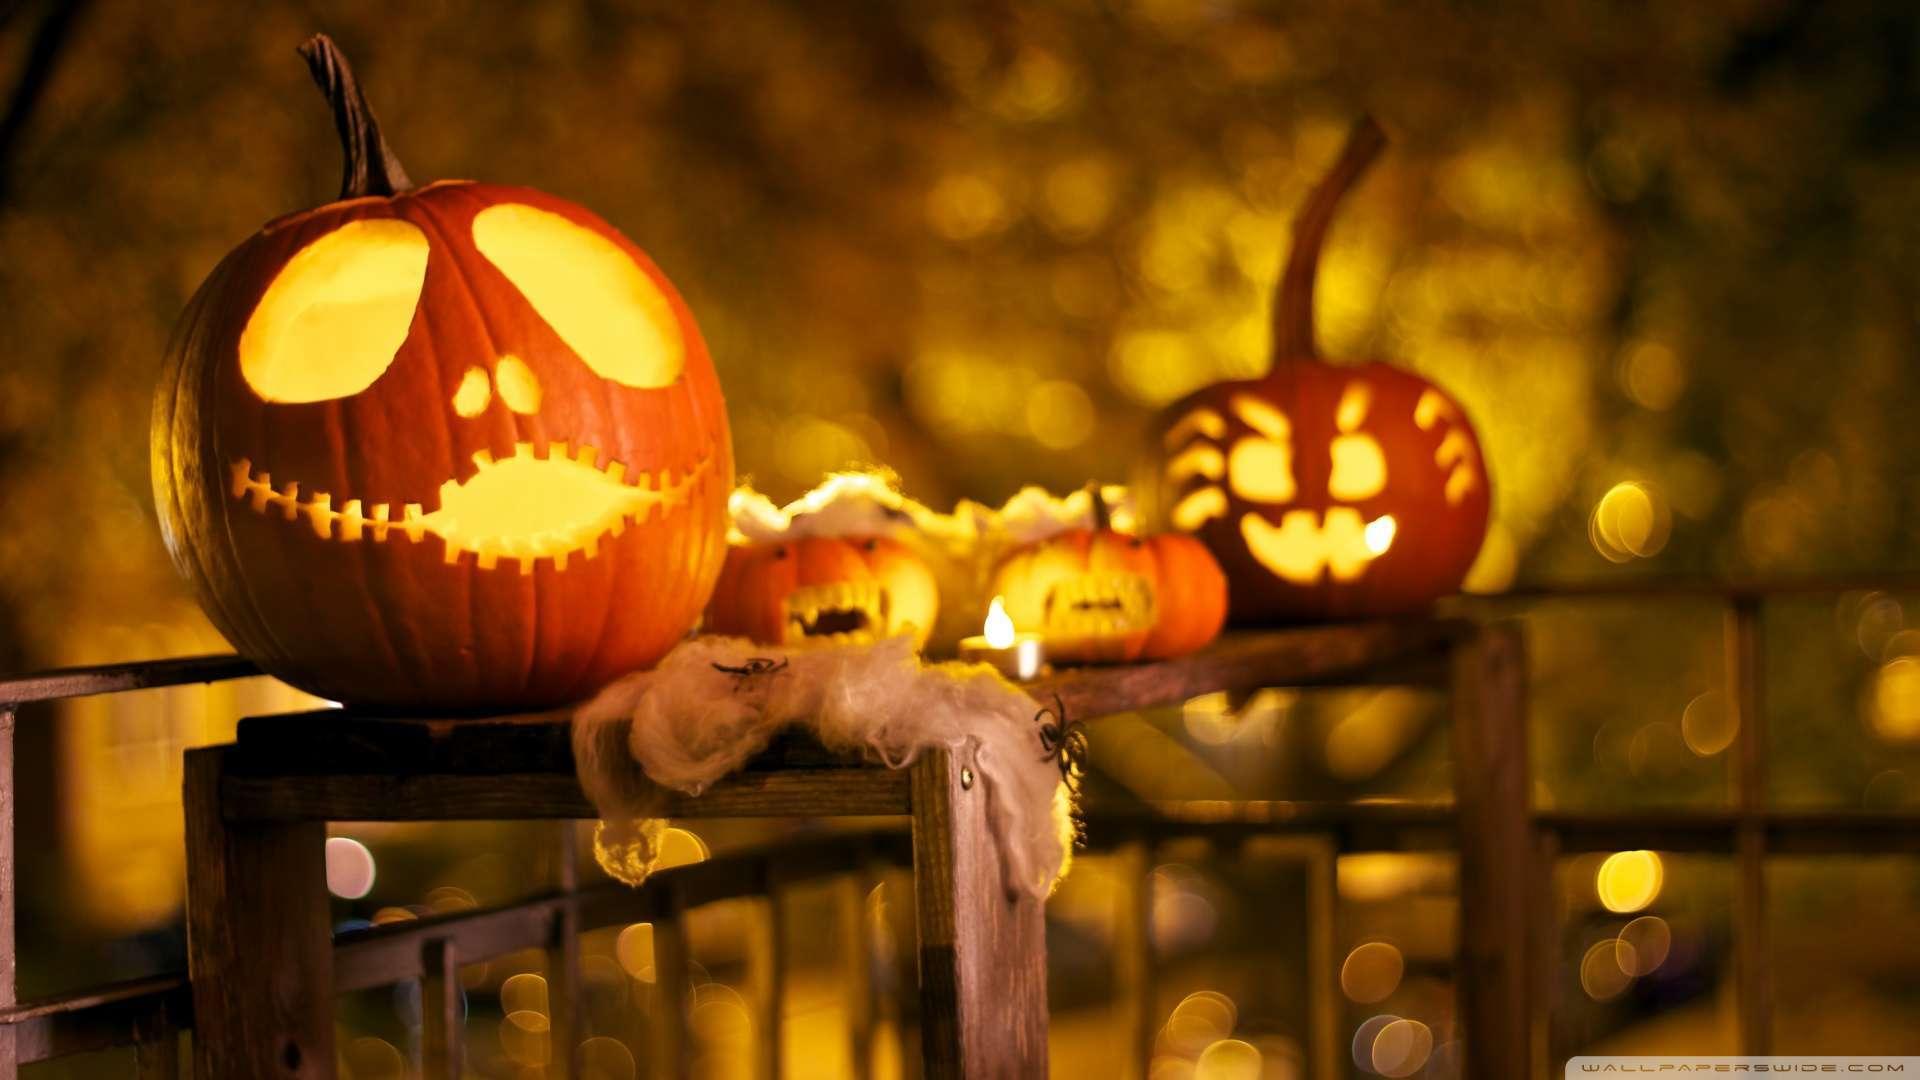 Jack and the Devil  halloween pumpkin